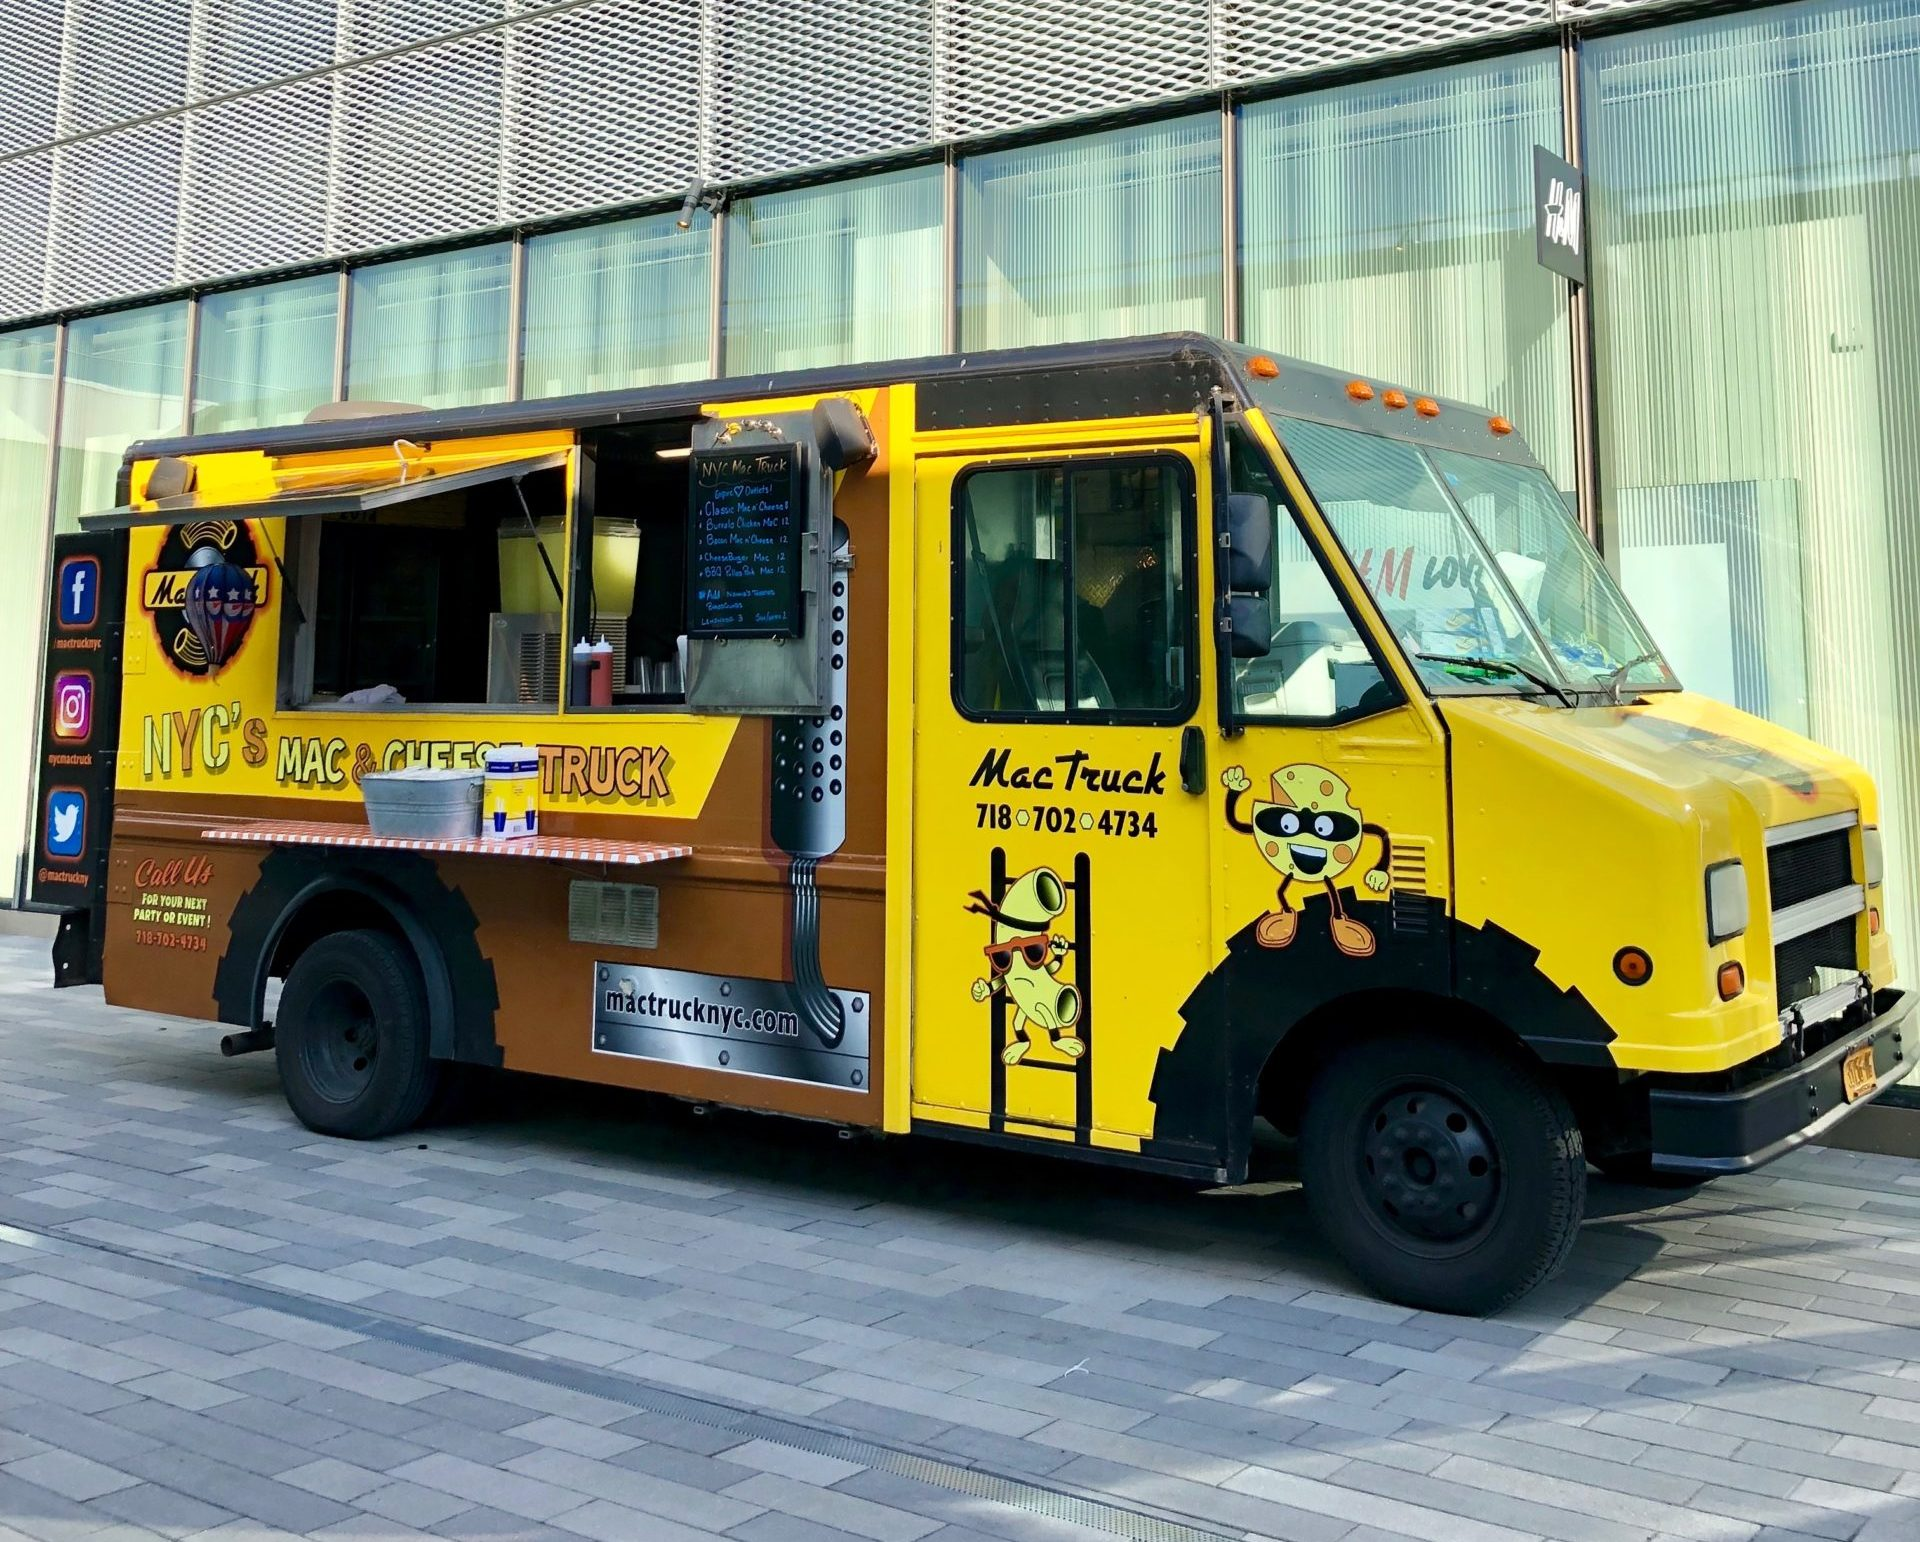 Mac n' cheese food truck catering NYC